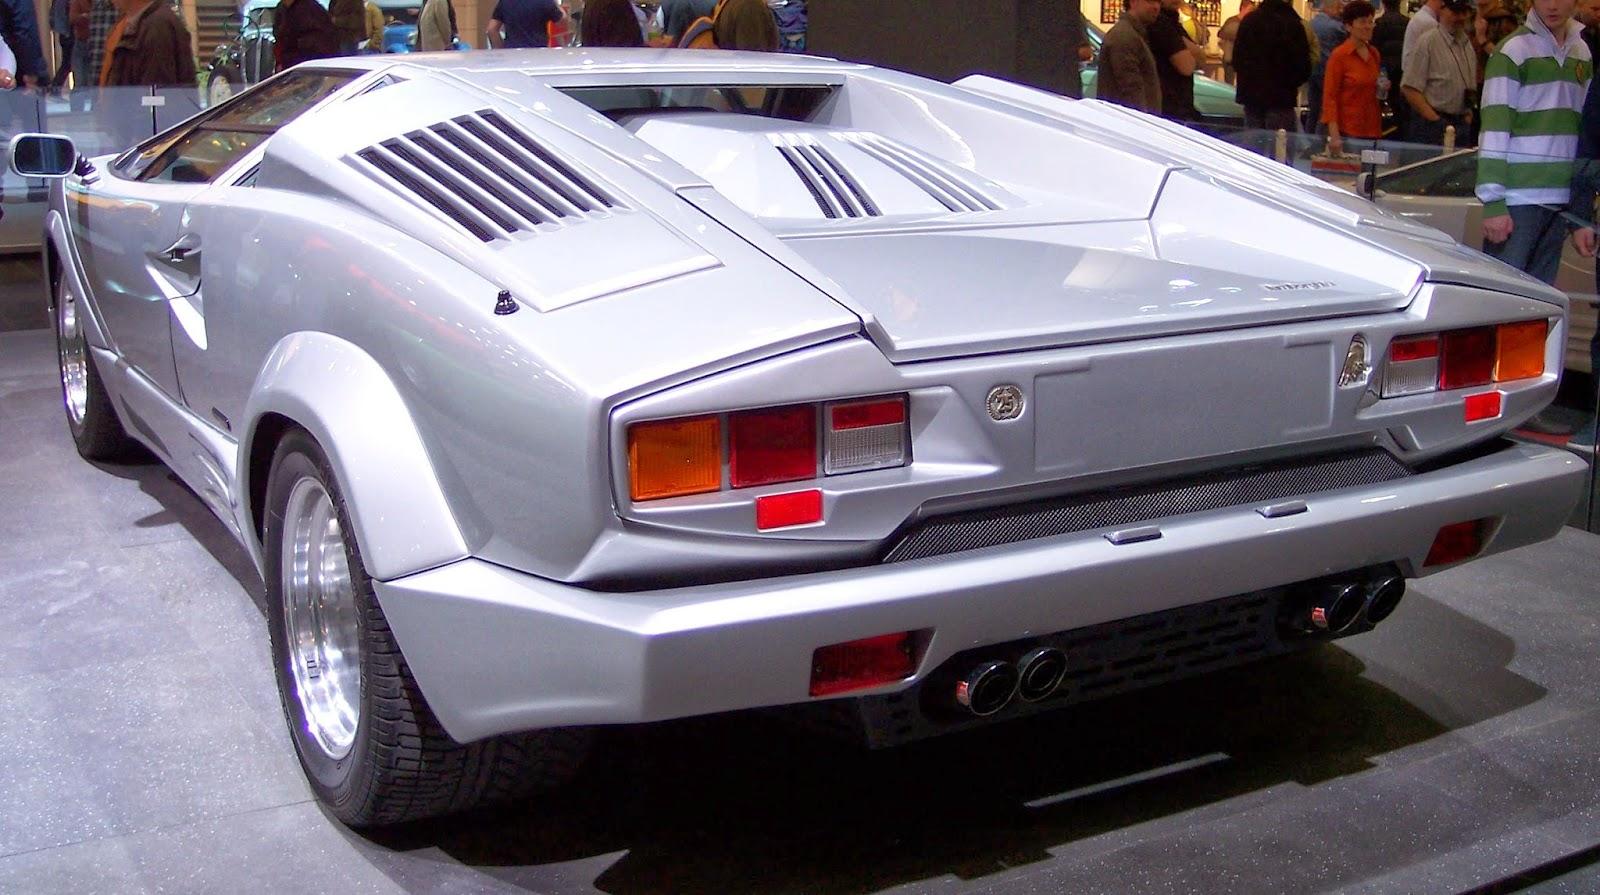 The Lamborghini Countach 25th Anniversary Edition Blueiskewl